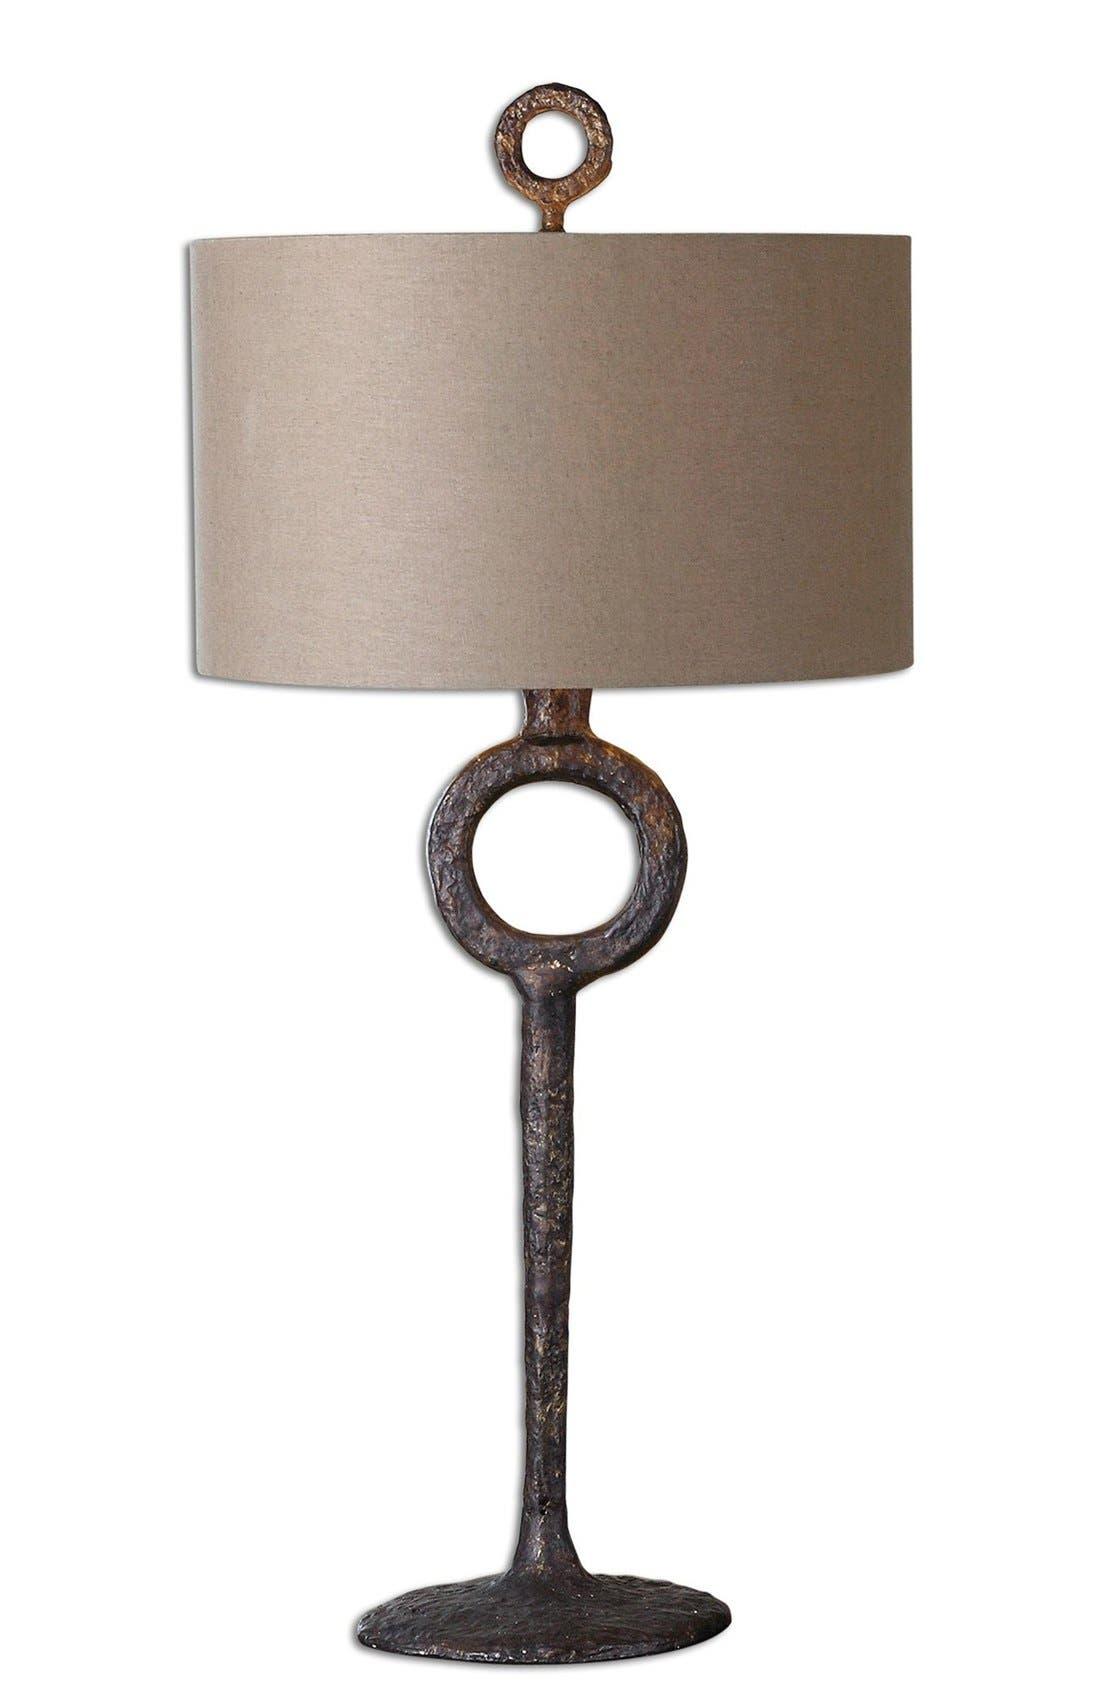 'Ferro' Cast Iron Table Lamp,                             Main thumbnail 1, color,                             200